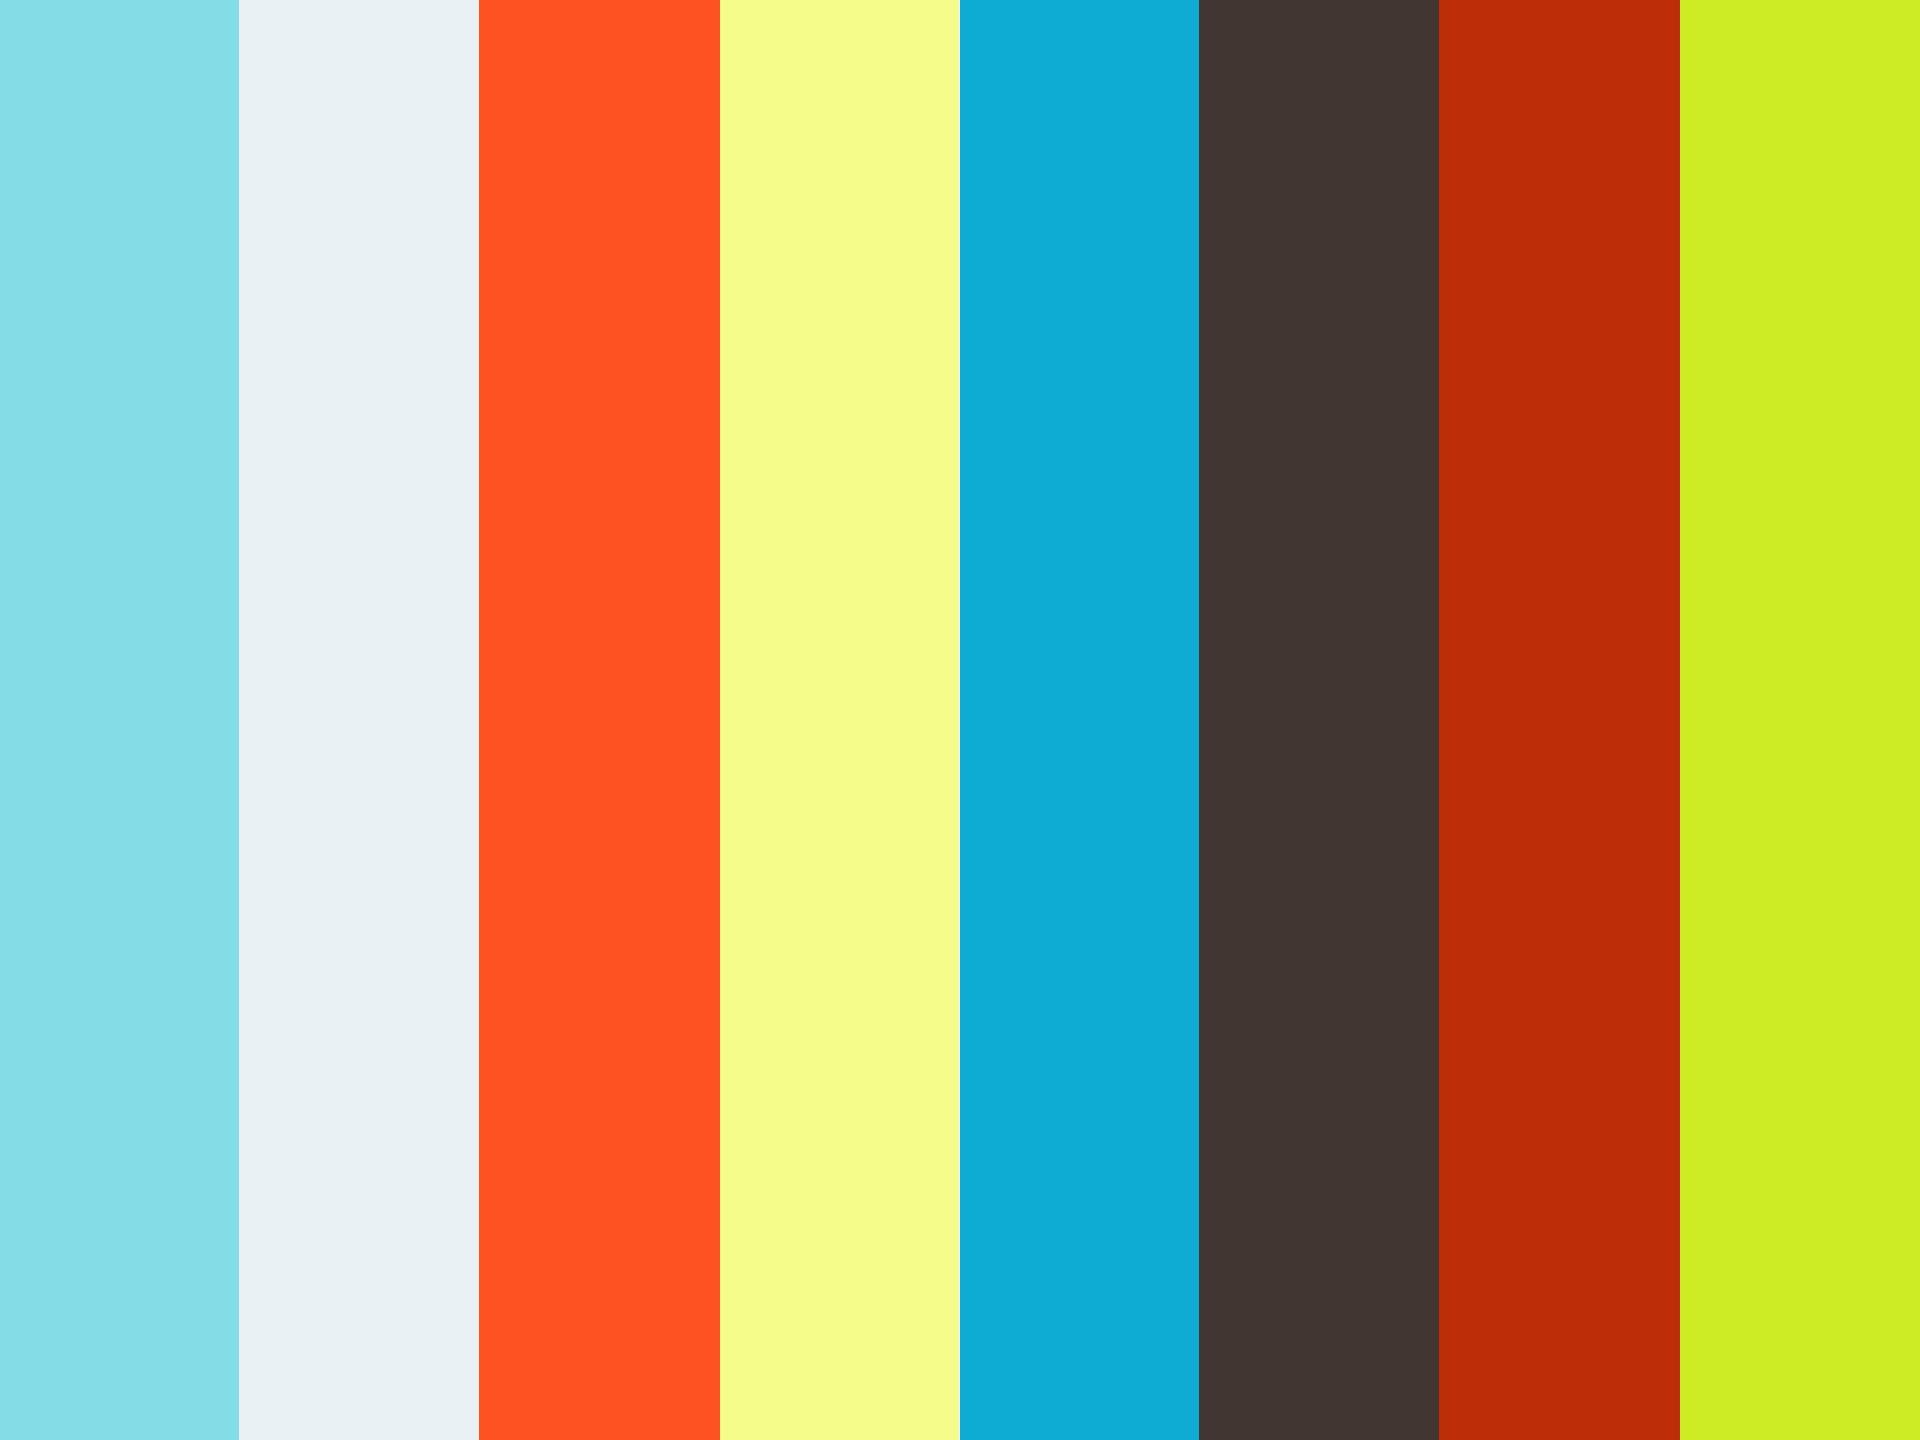 MERCEDES BENZ E300 - BLACK - 2018